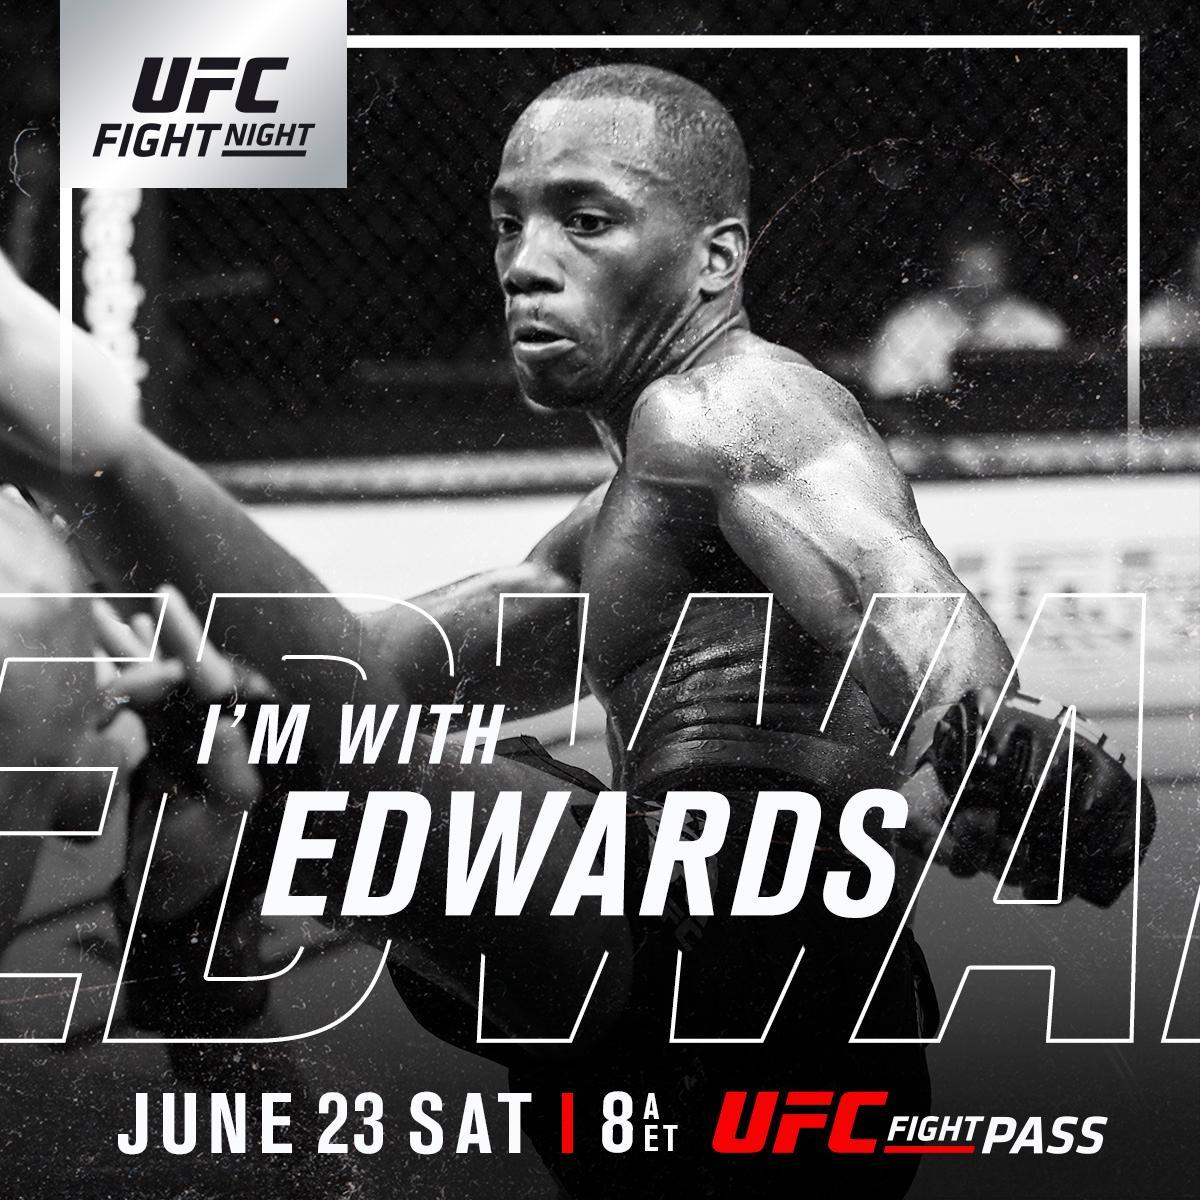 RT if you're w/ @Leon_EdwardsMMA at #UFCSingapore | TOMORROW | LIVE on @UFCFightPass! ➡️ https://t.co/cTQ7iRDGiW ⬅️ https://t.co/4ZfqKZxZss